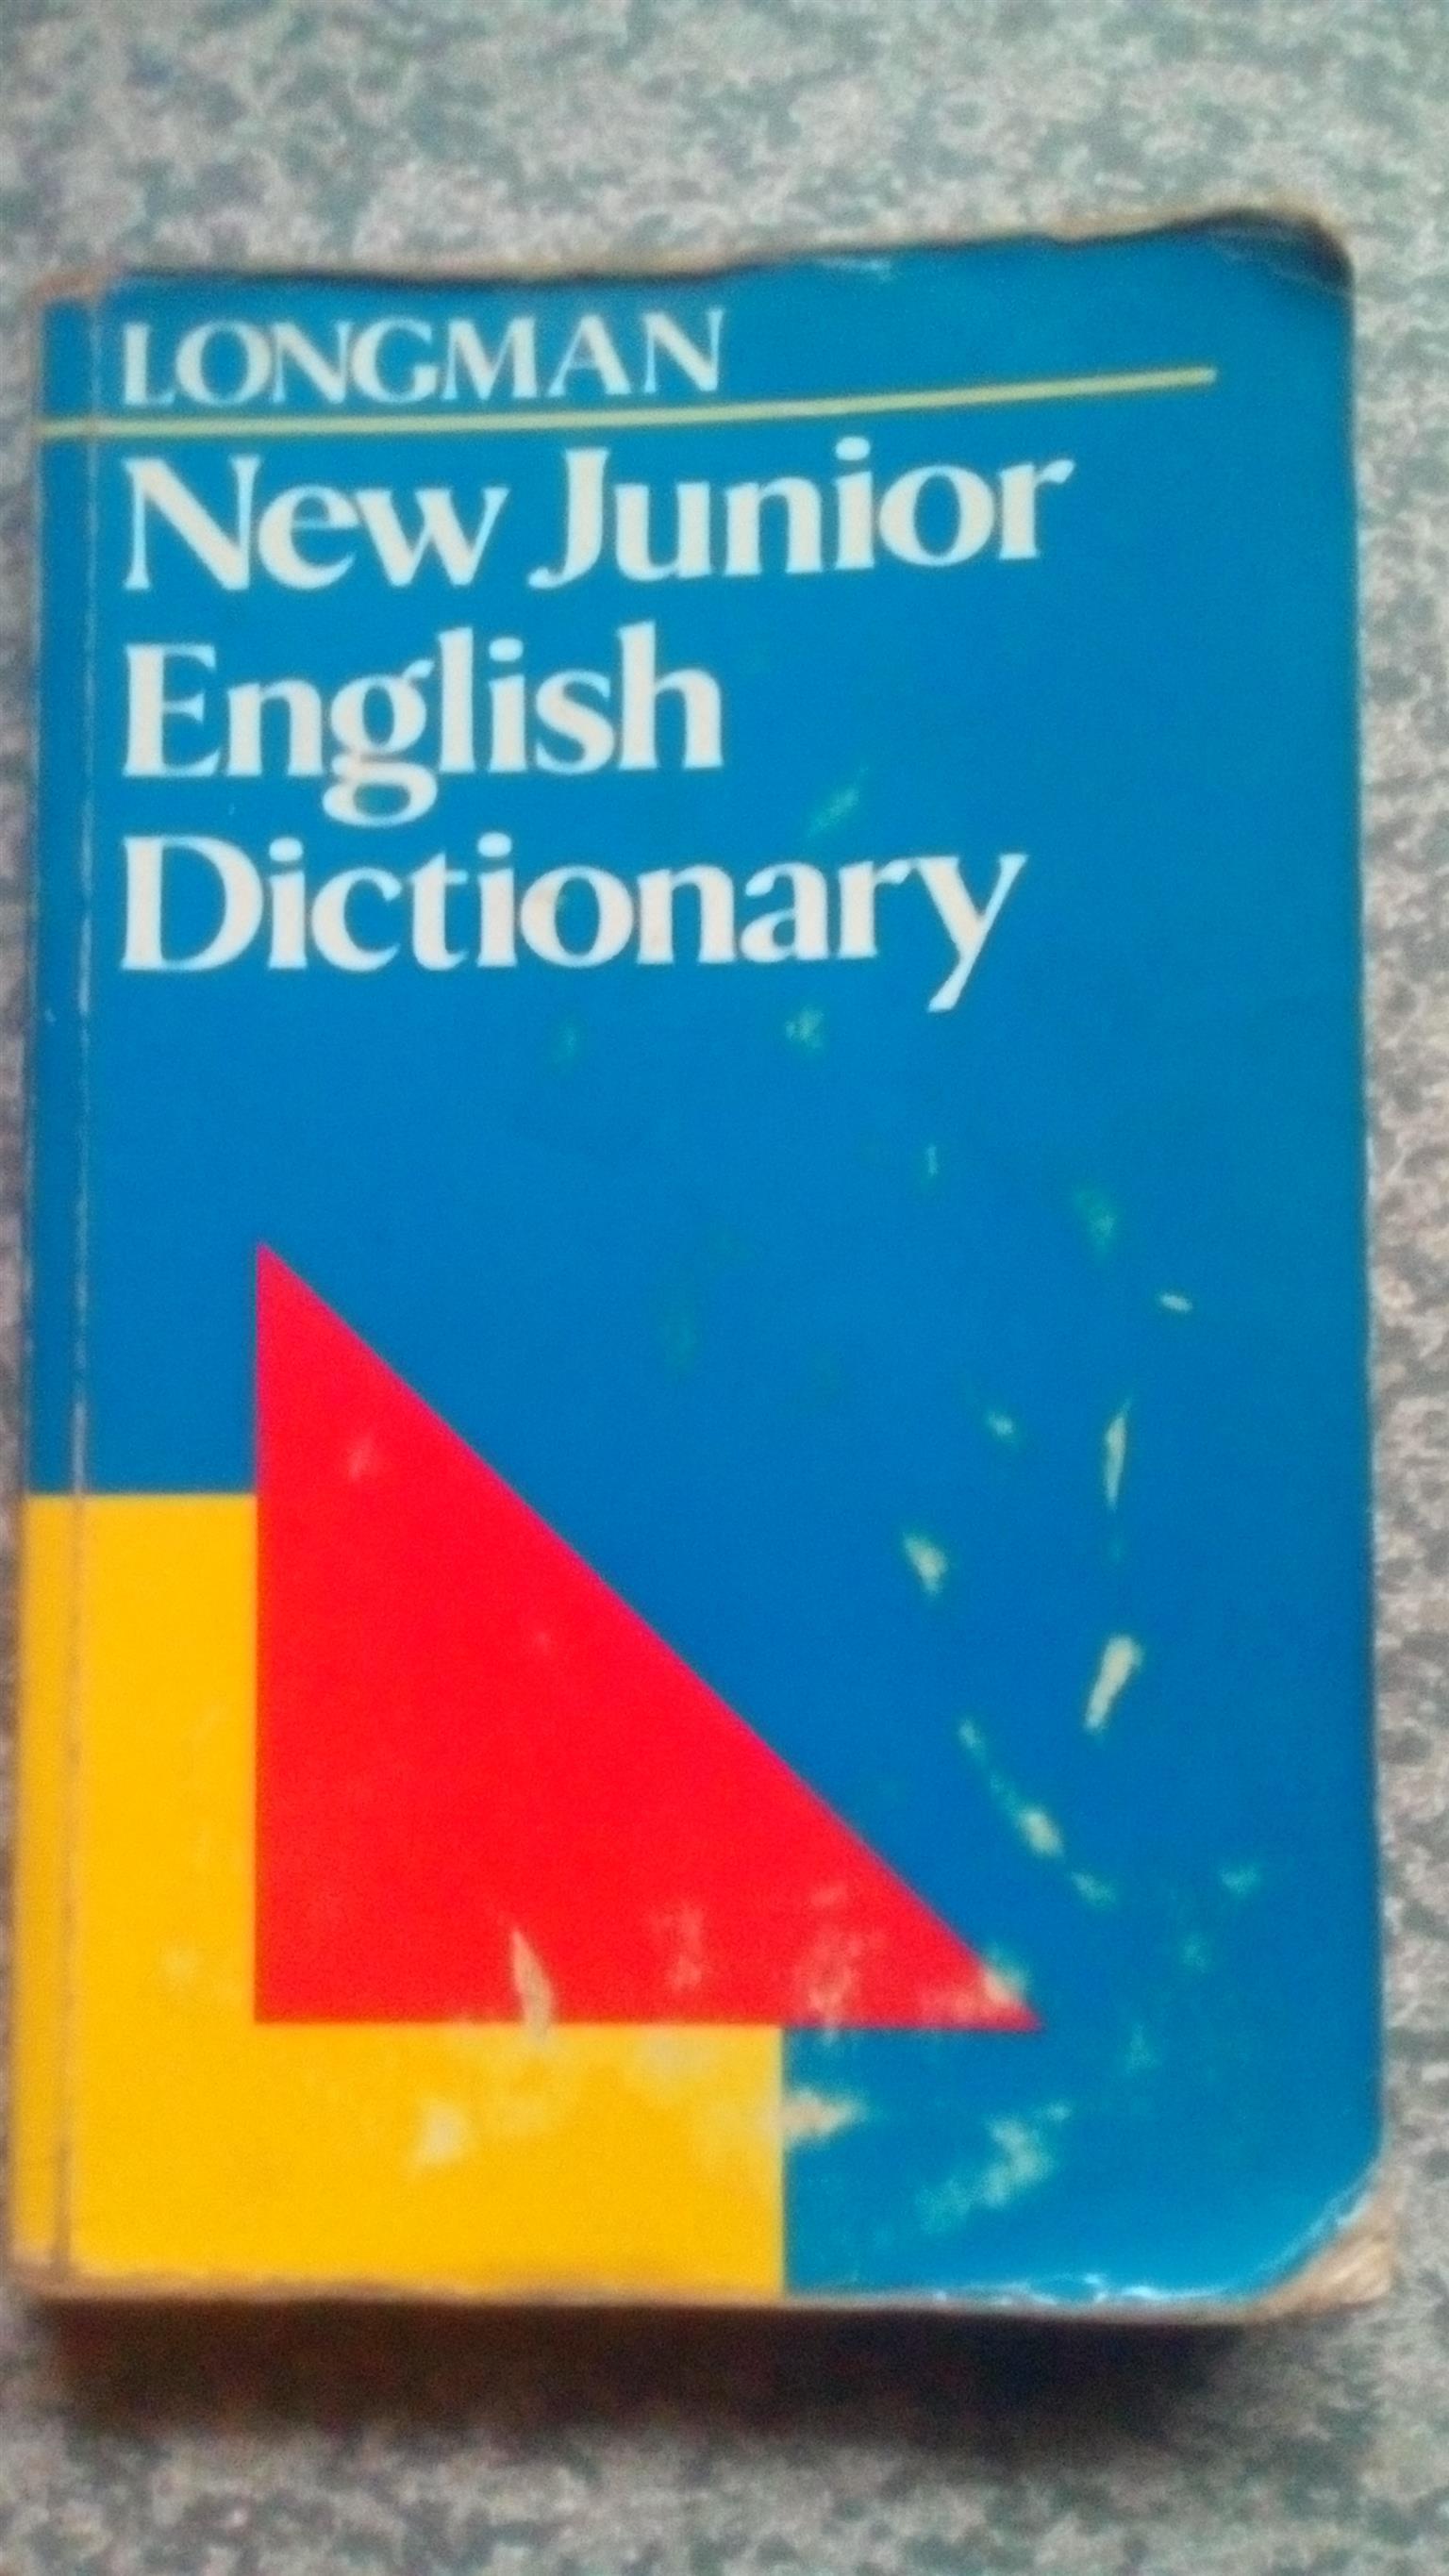 Longman New Junior English Dictionary by Della Summers